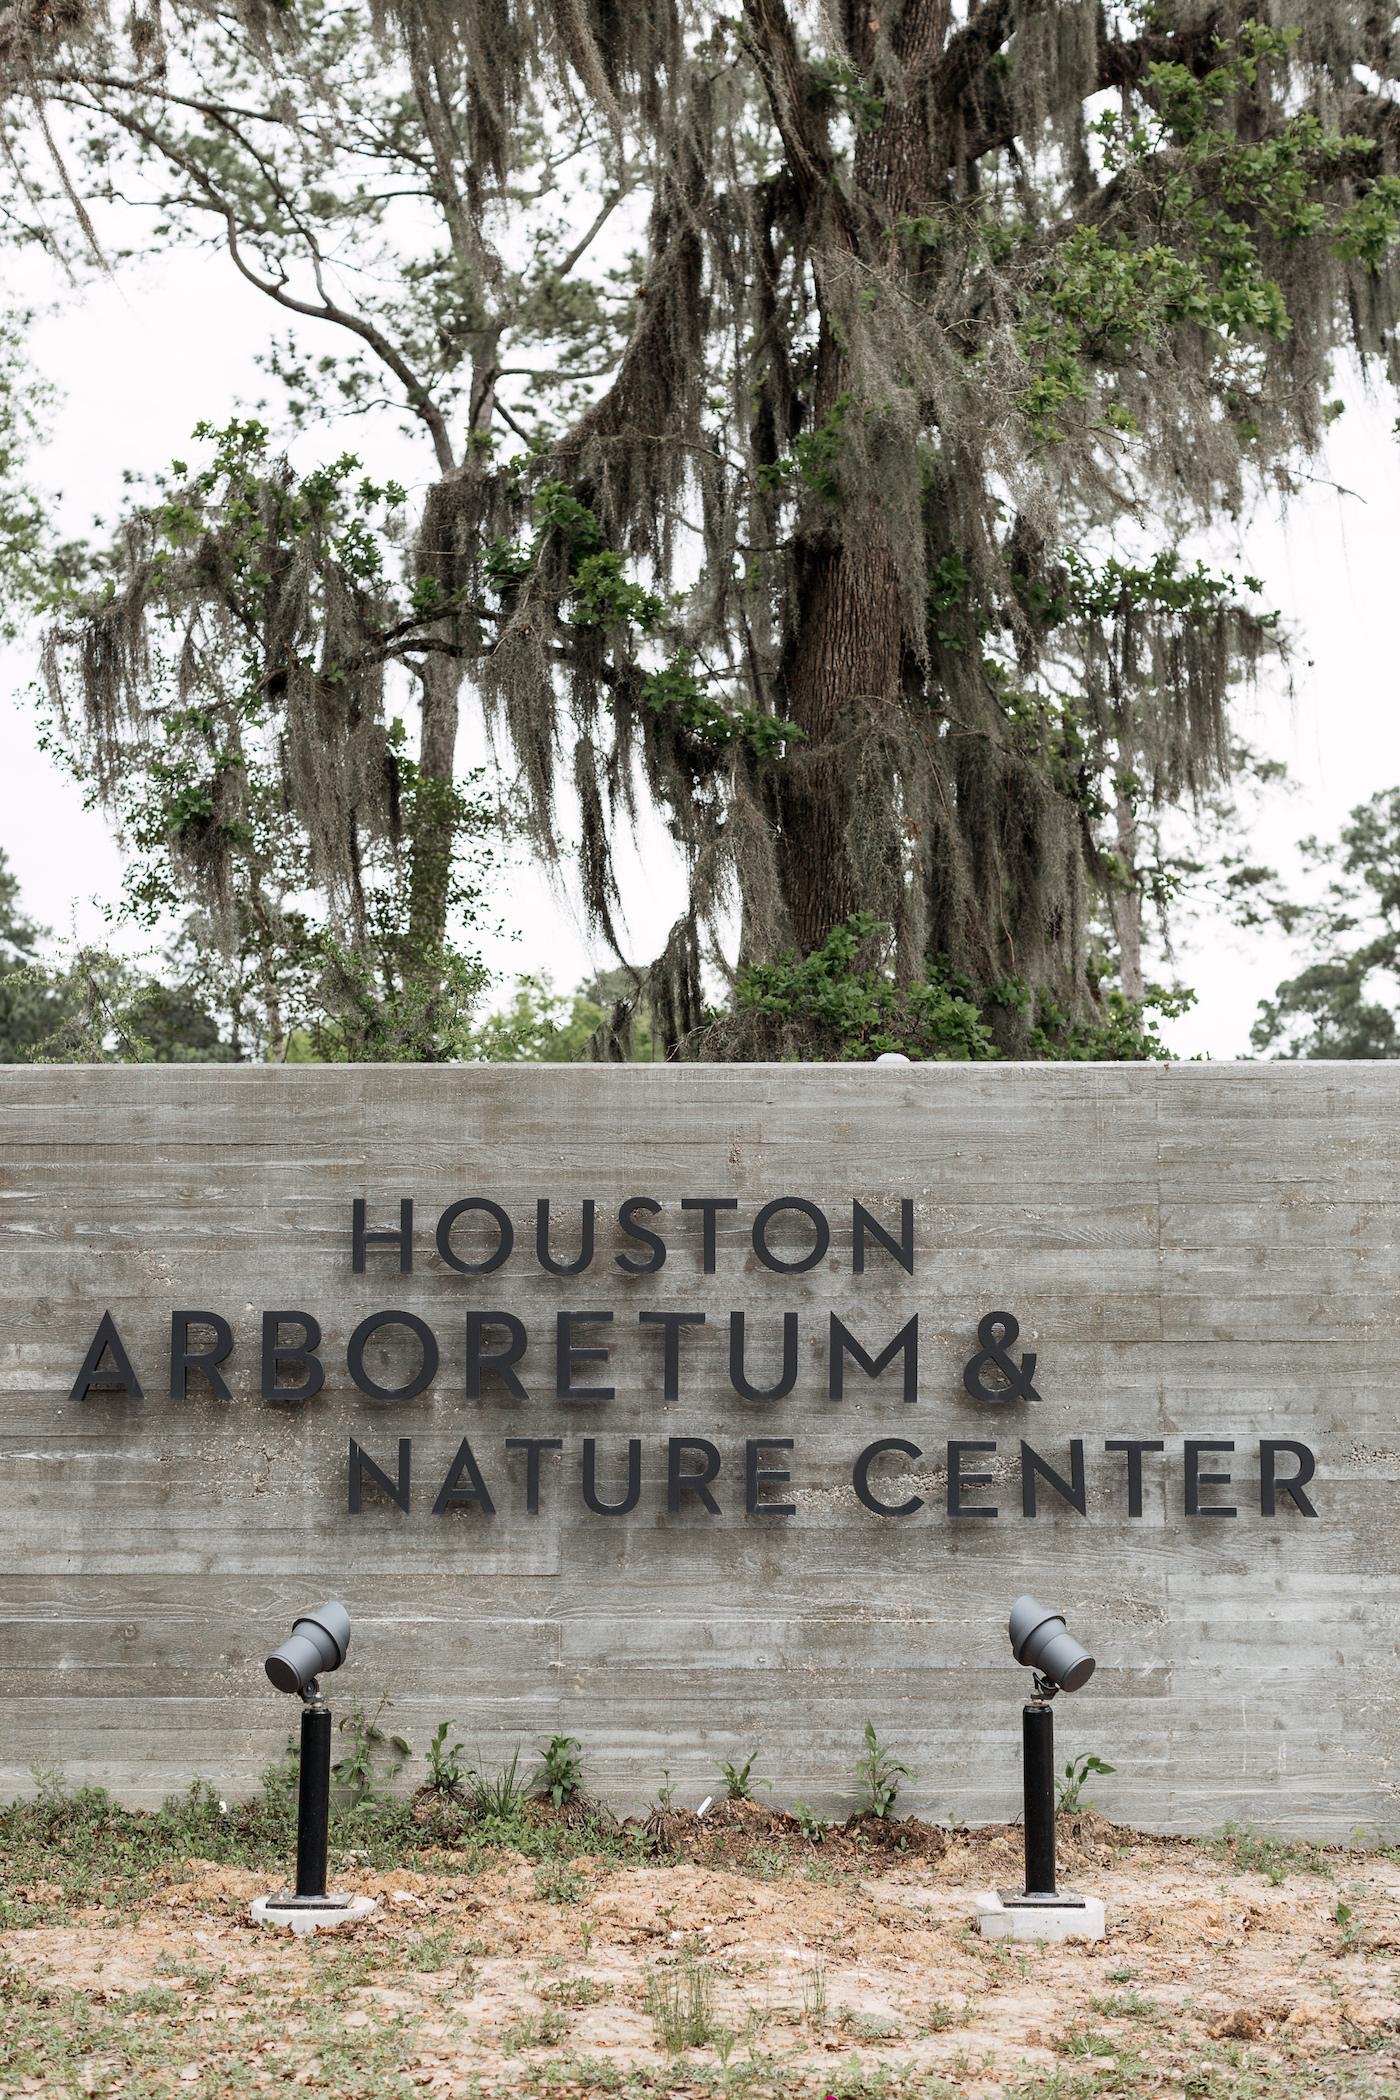 Matthew&Justeen'sWedding_HoustonArboretum&NatureCenter3.16.19©www.kristencurette.com02646-Edit